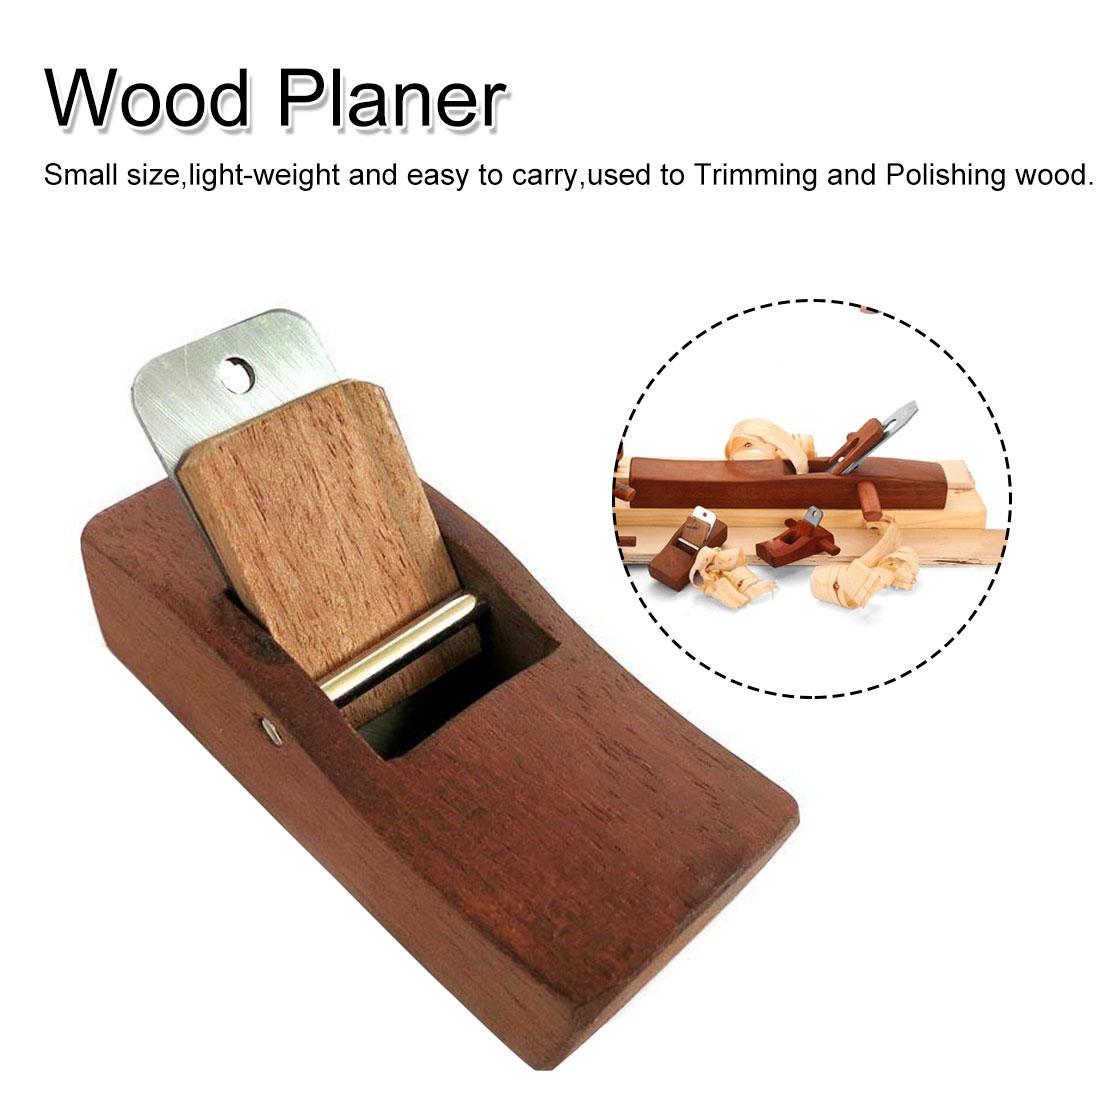 Mini Planer Carpenter Hand Wood Planing Manual Trimming DIY Tool Woodworking Craft for Home Garden Carpenter Tool